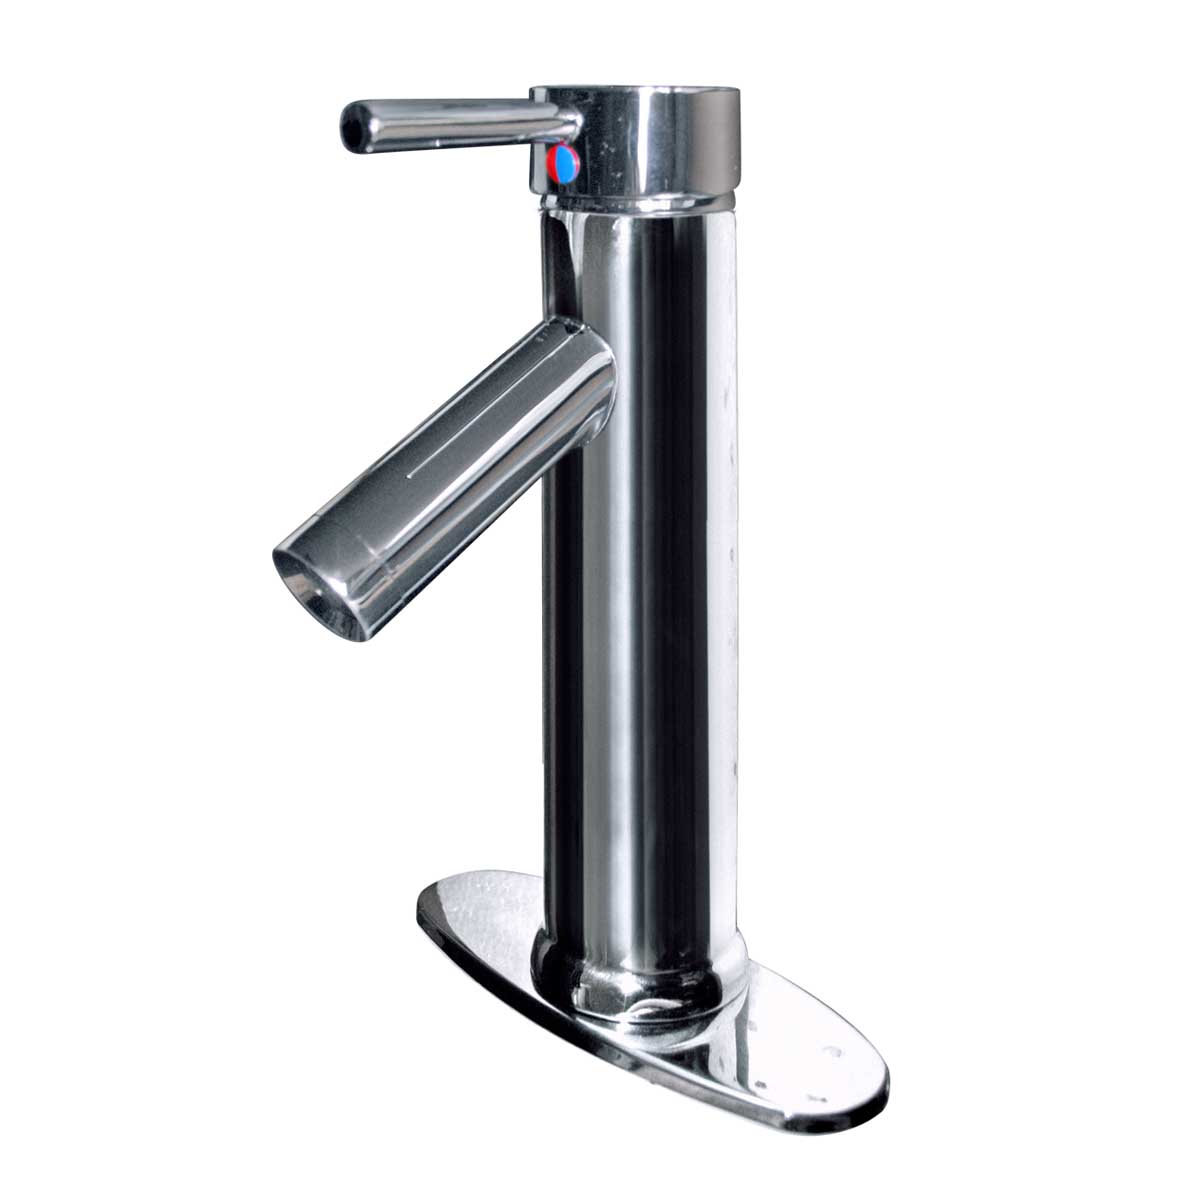 Single Hole Bathroom Sink Faucet Chrome Centerset Plate |...